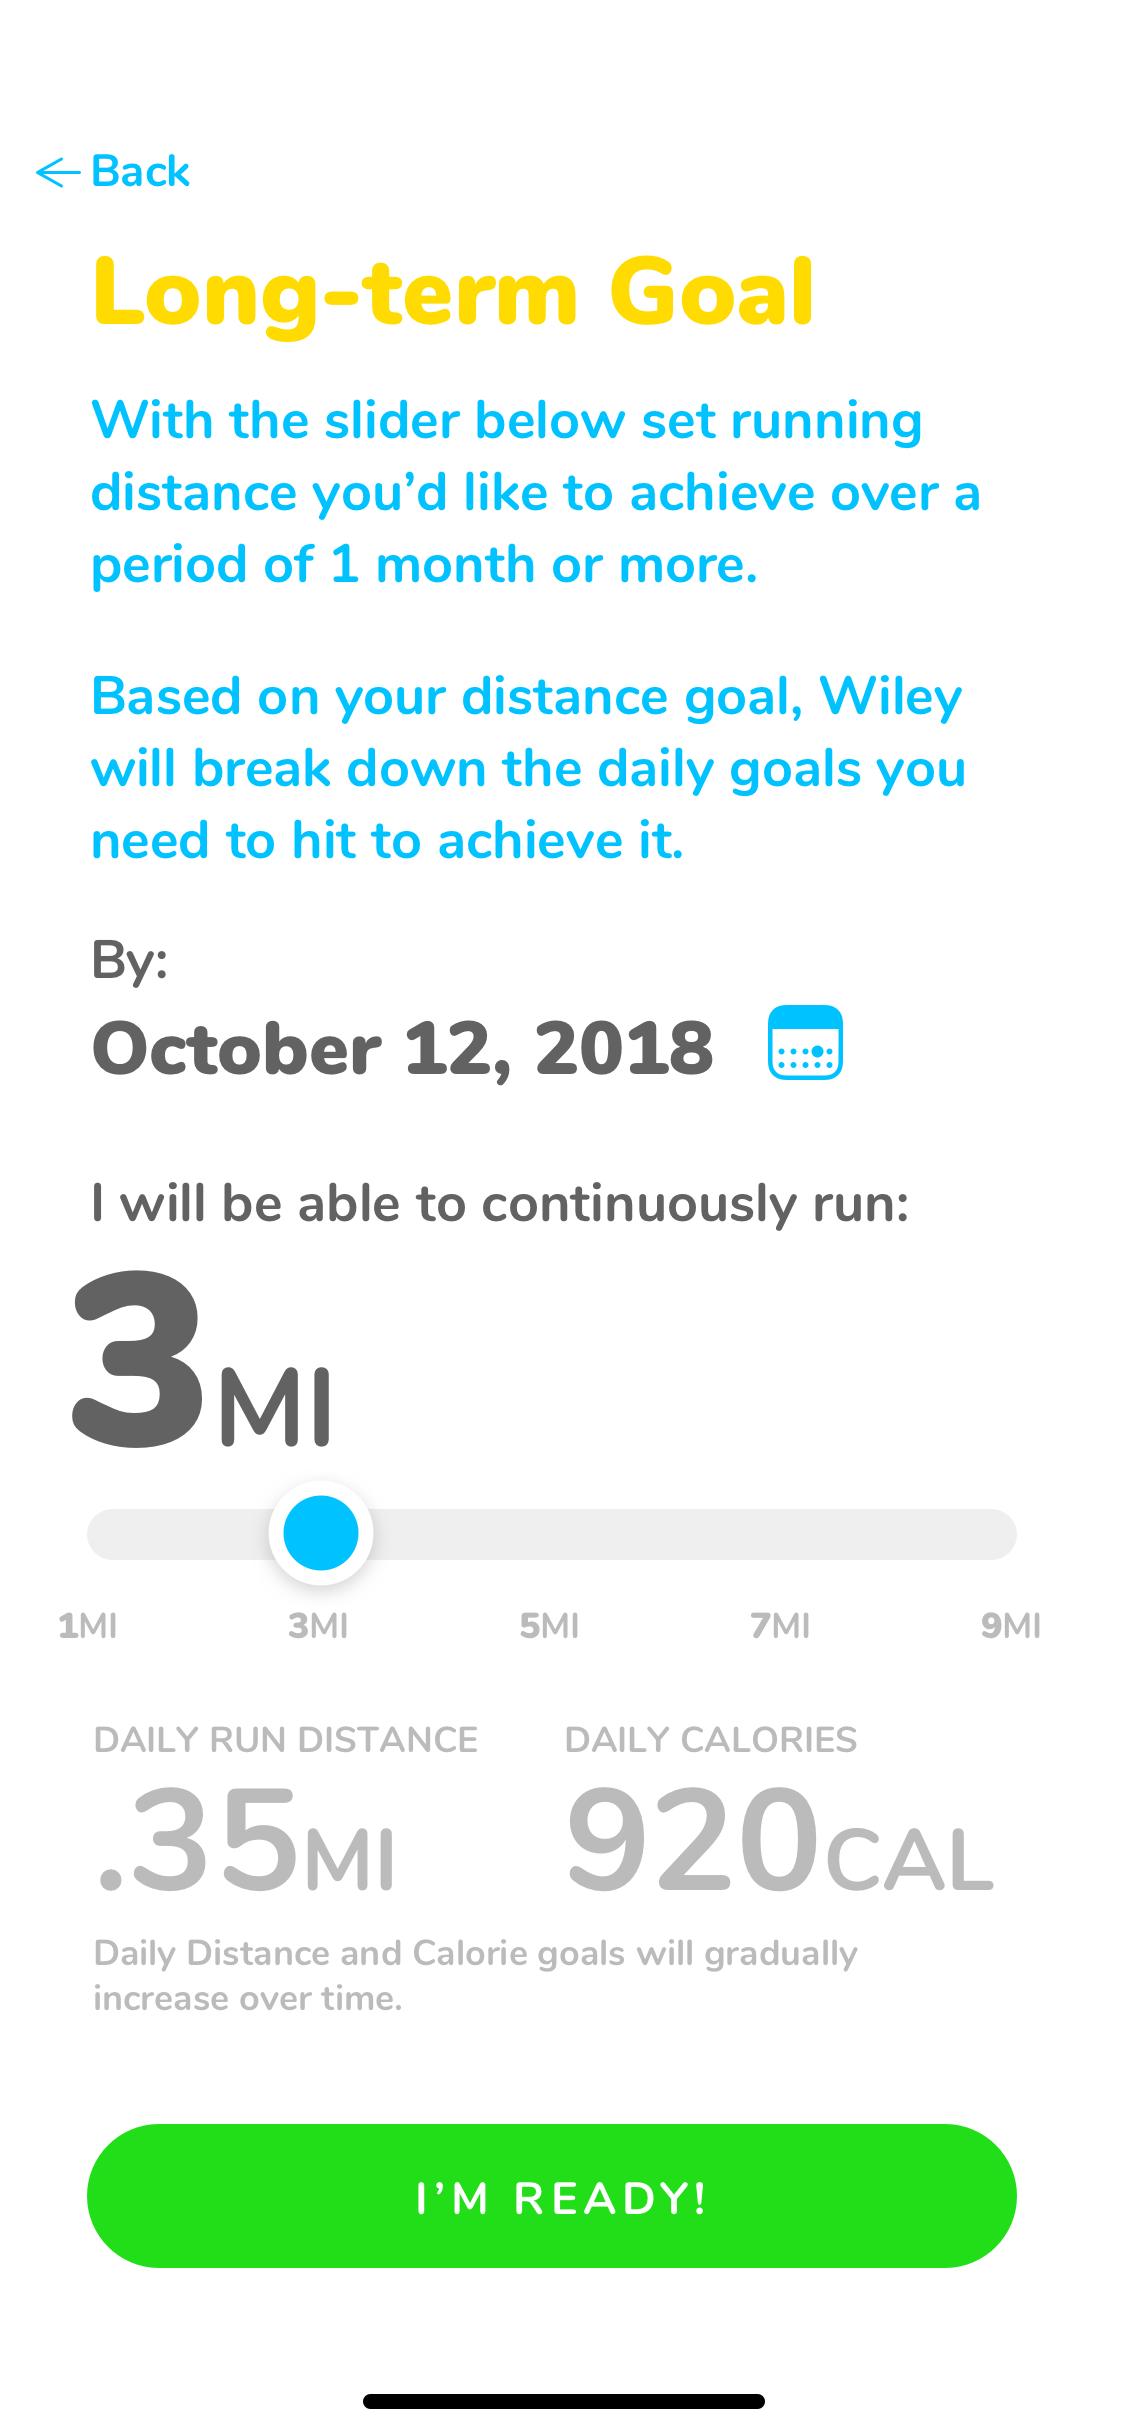 Wiley-01-Long-term-Goal